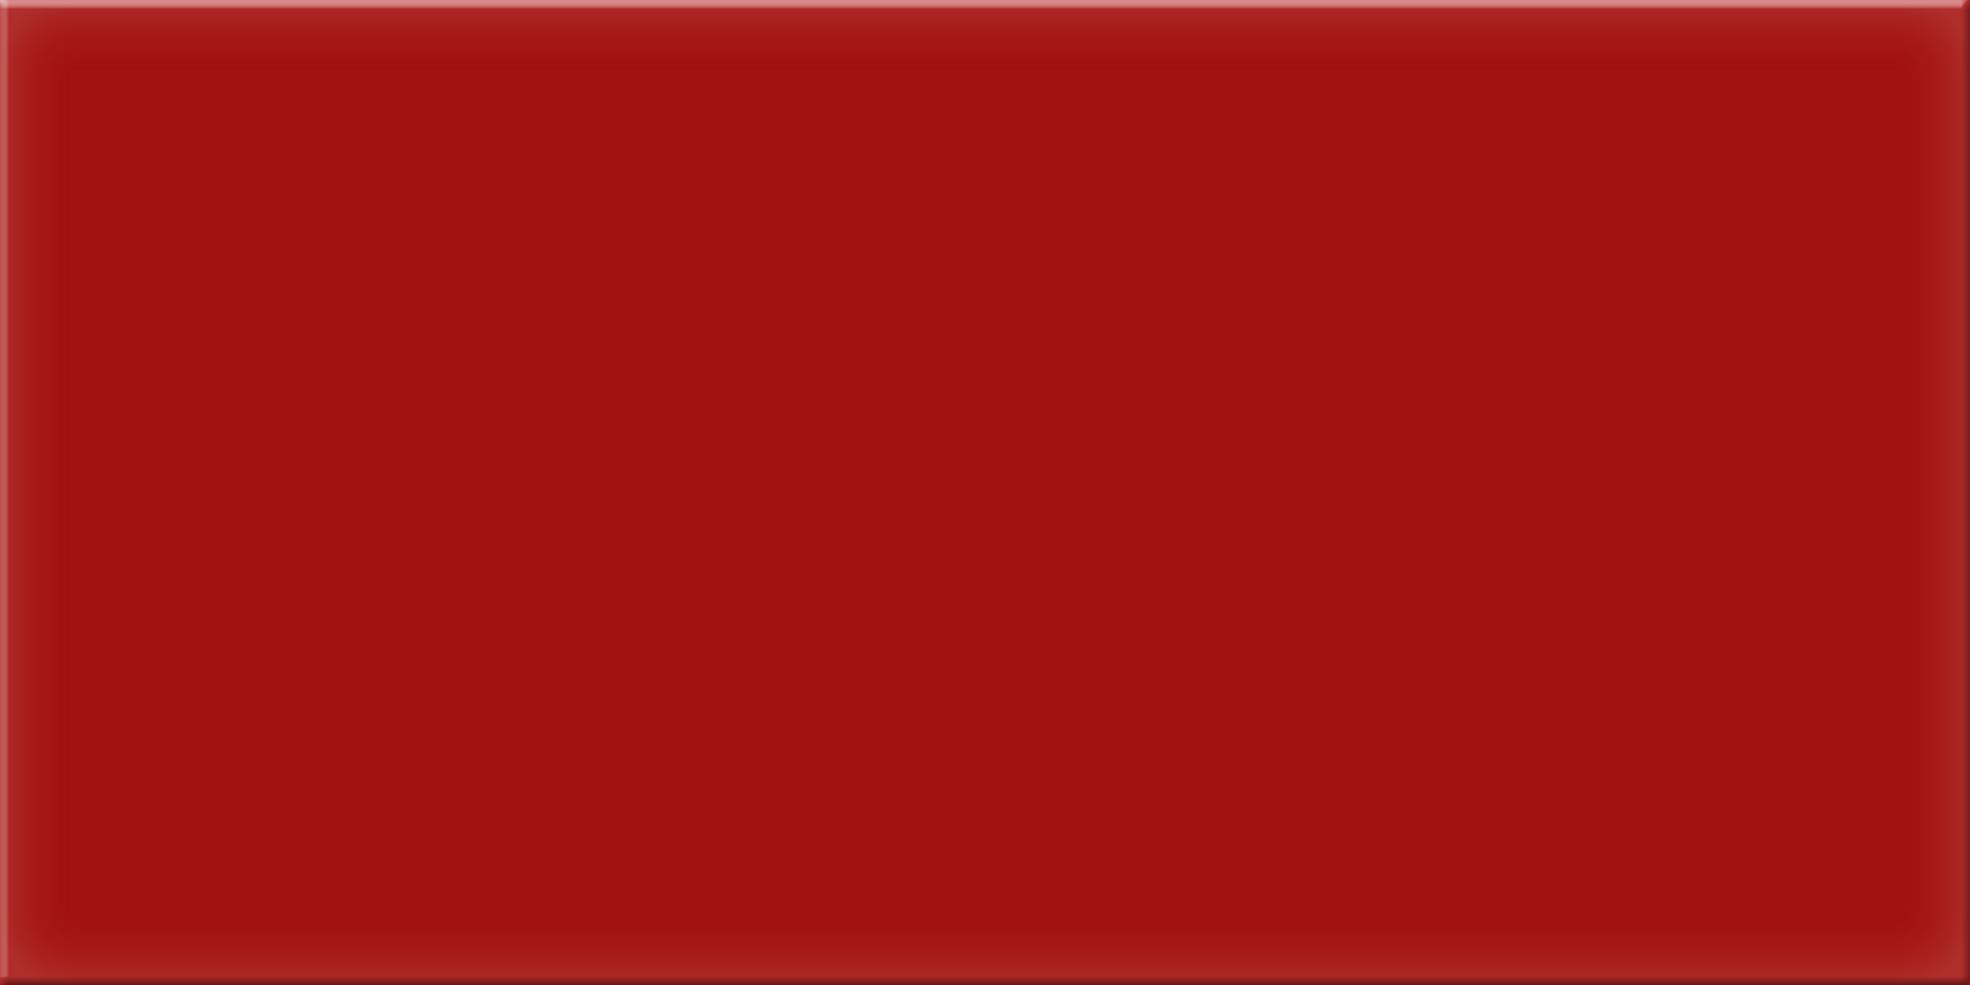 40-2296, Harmony Arquitectos, Punainen, seina